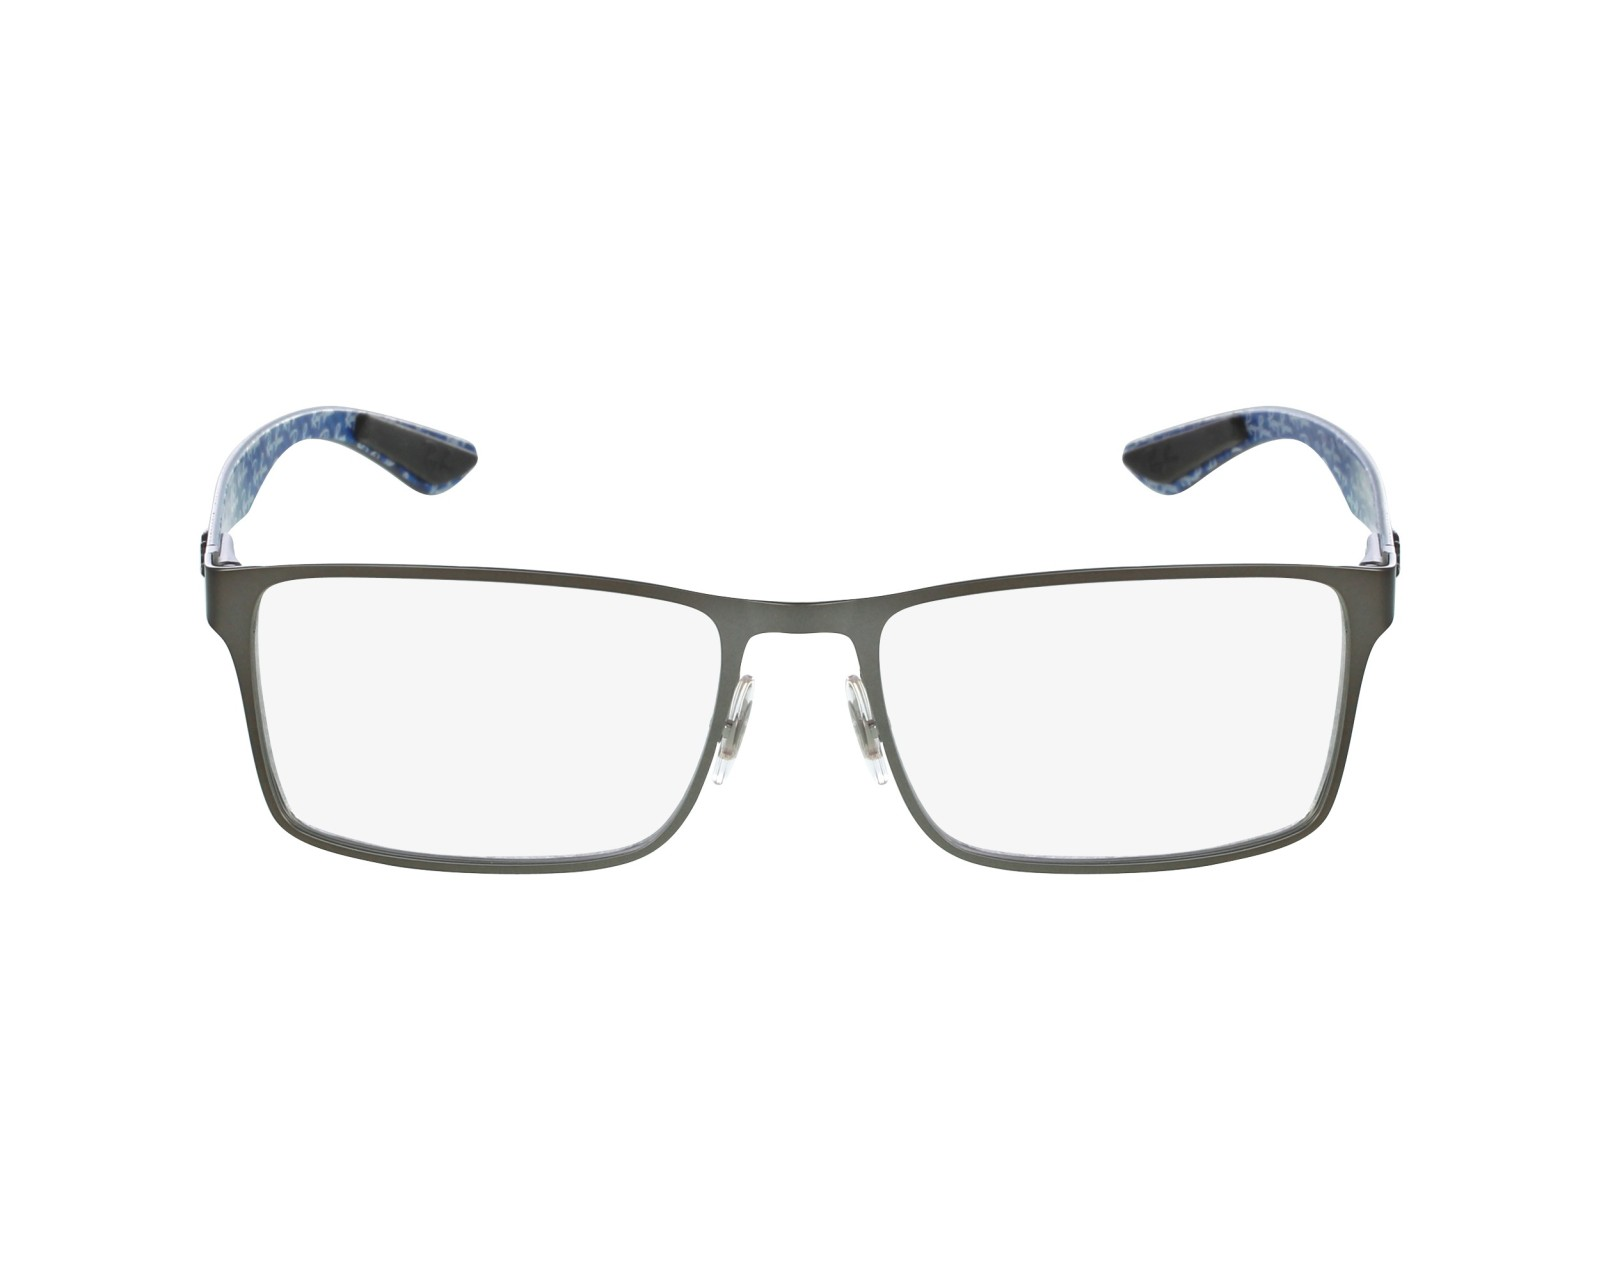 f930d25303 Ray Ban Rx8415 Eyeglasses « Heritage Malta